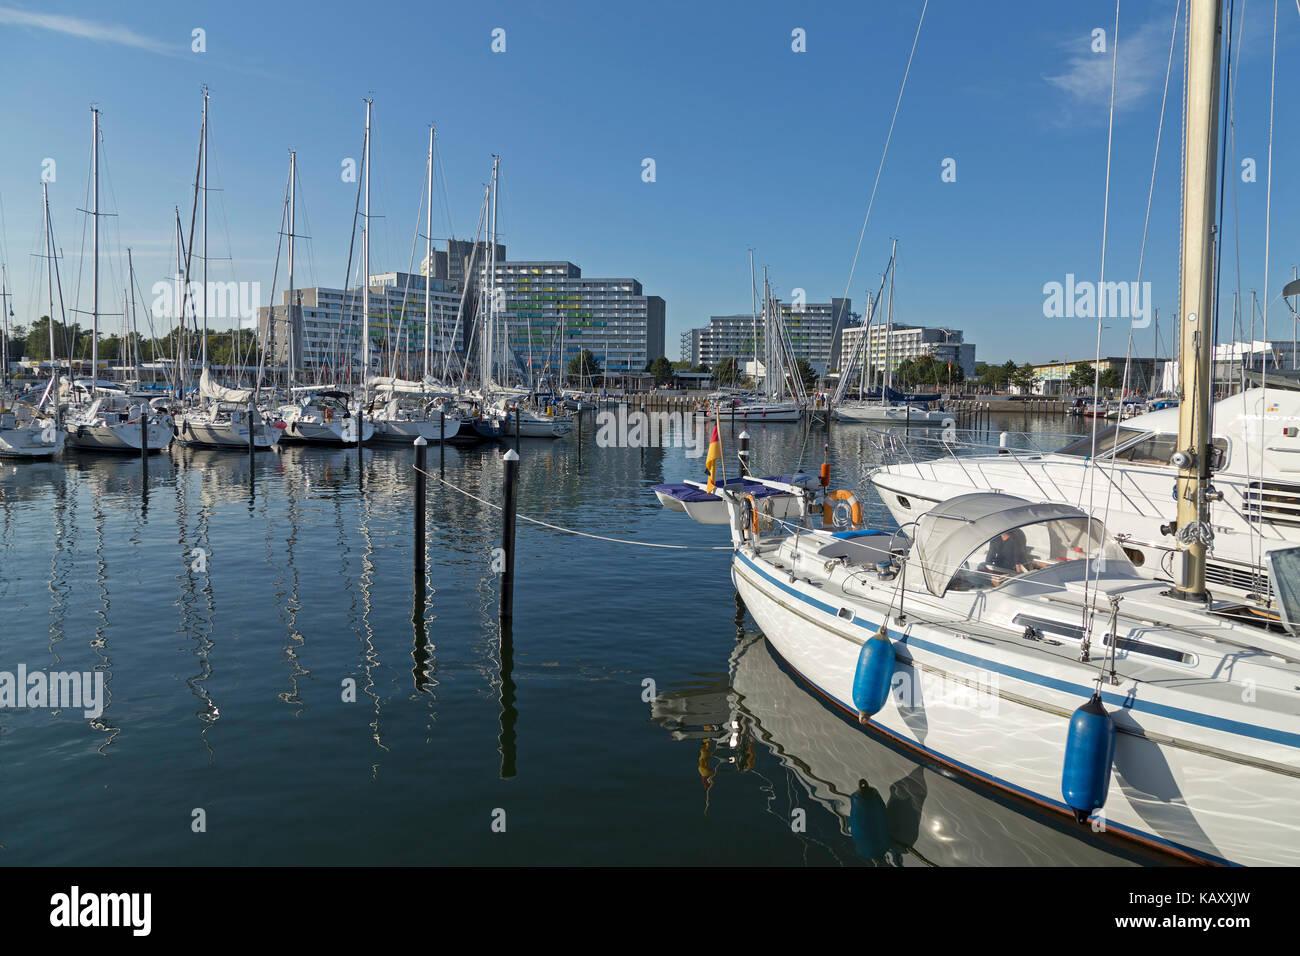 marina, Baltic Sea Spa Damp, Schleswig-Holstein, Germany - Stock Image